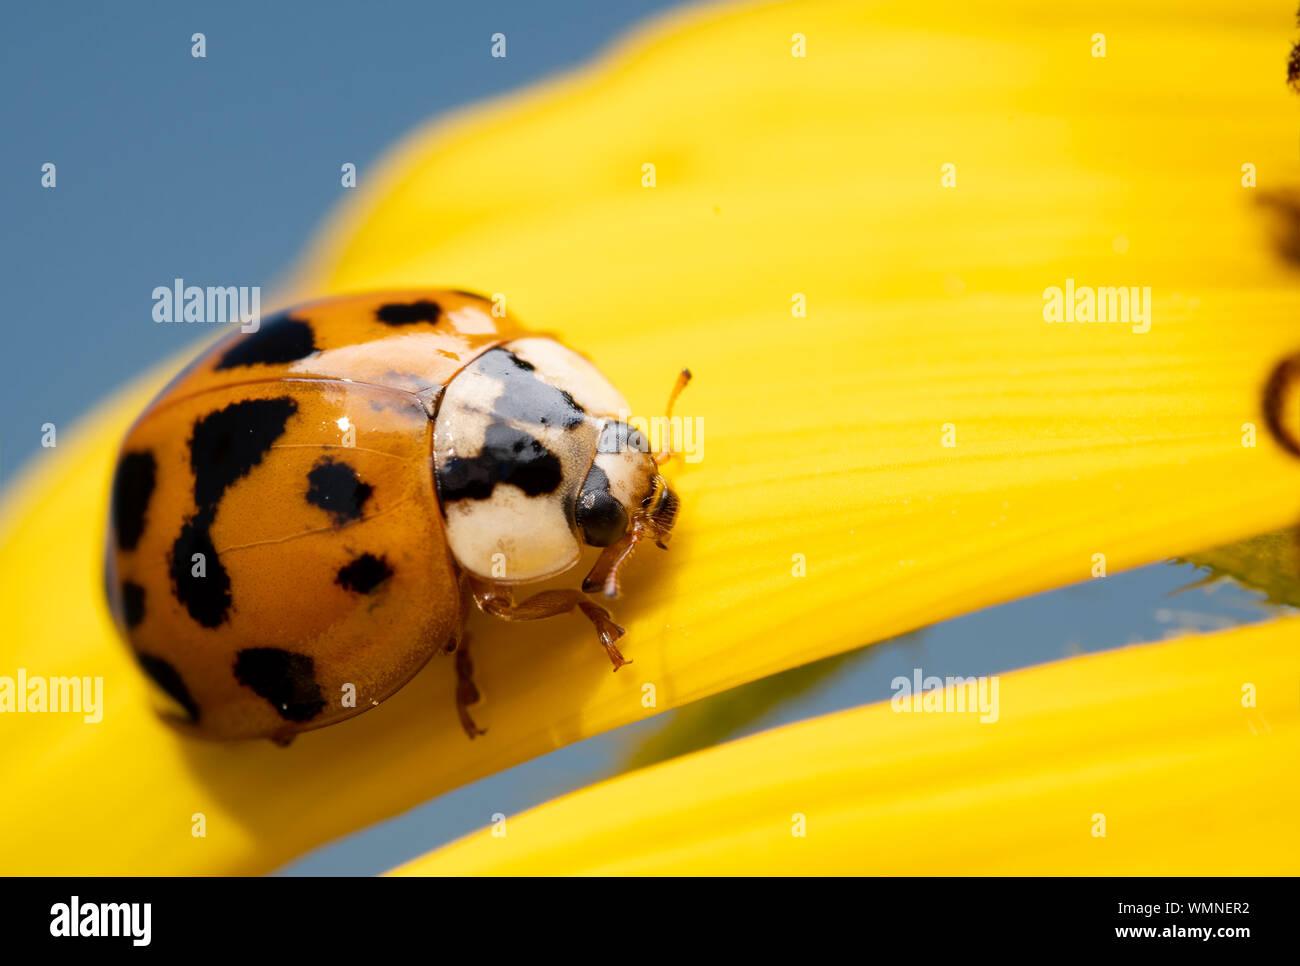 Asian Ladybeetle, Harmonia axyridis, on a bright yellow wild Sunflower petal with blue sky background Stock Photo